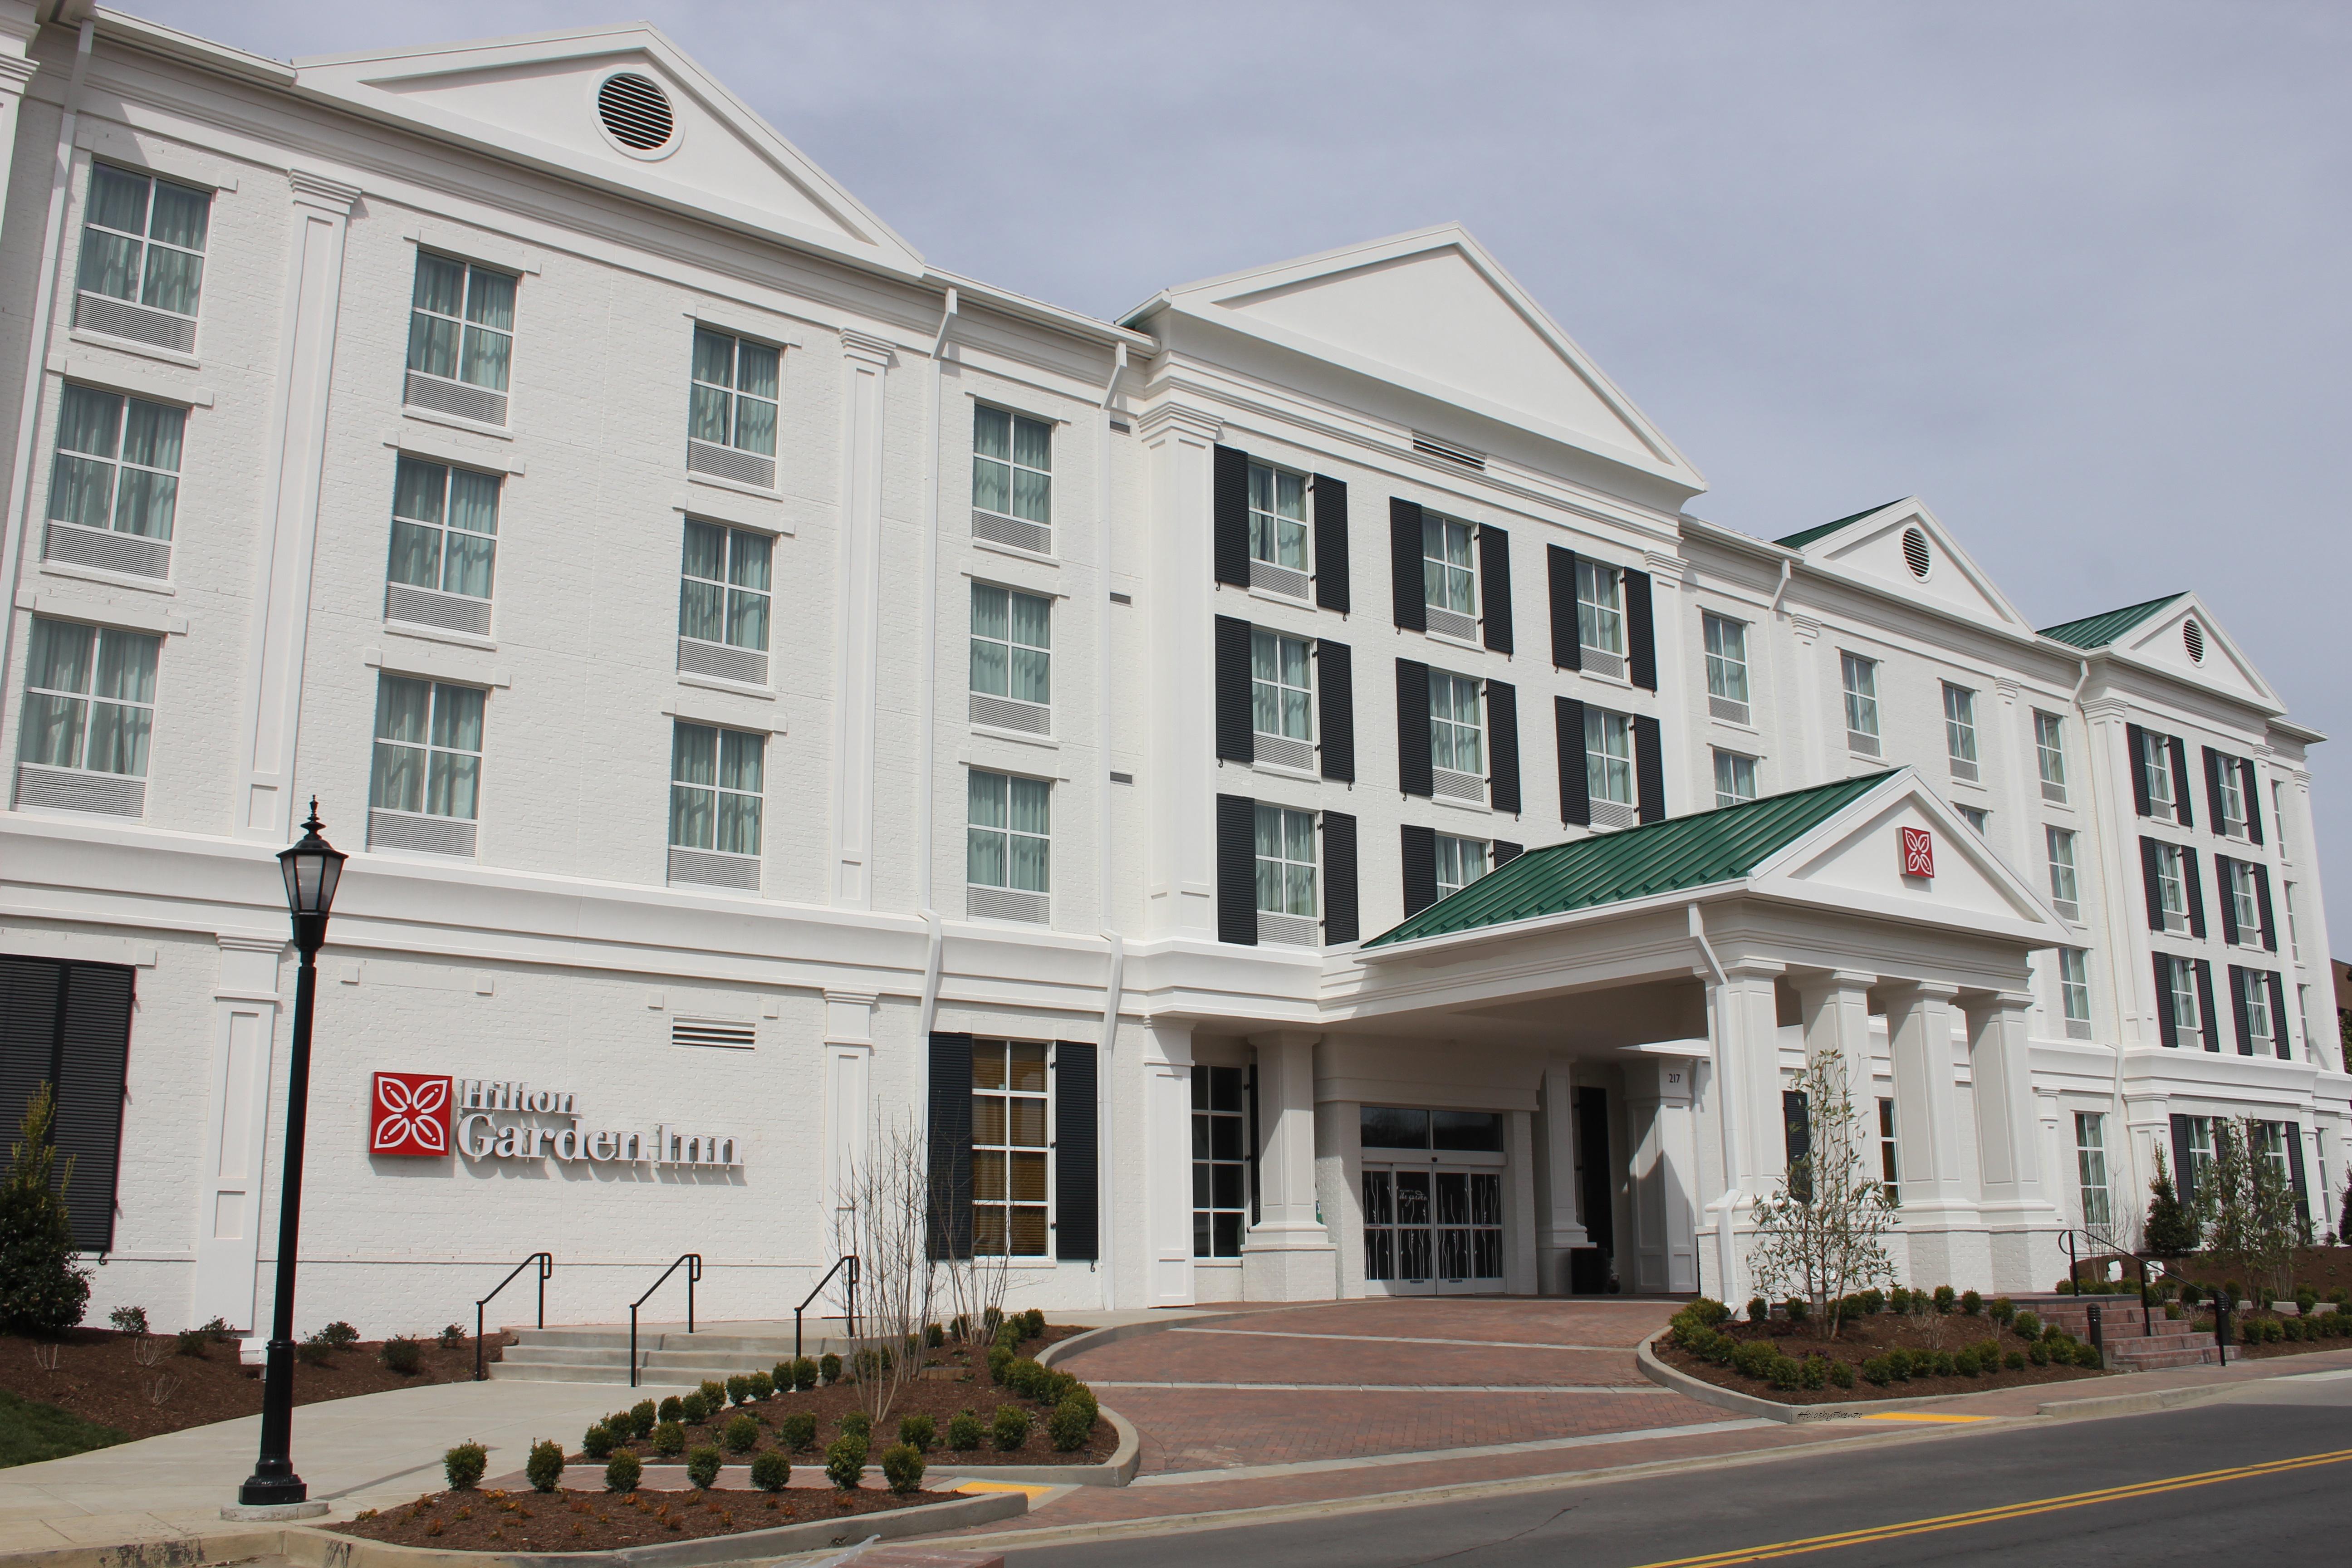 Hilton Garden Inn Opens New Property in Brentwood